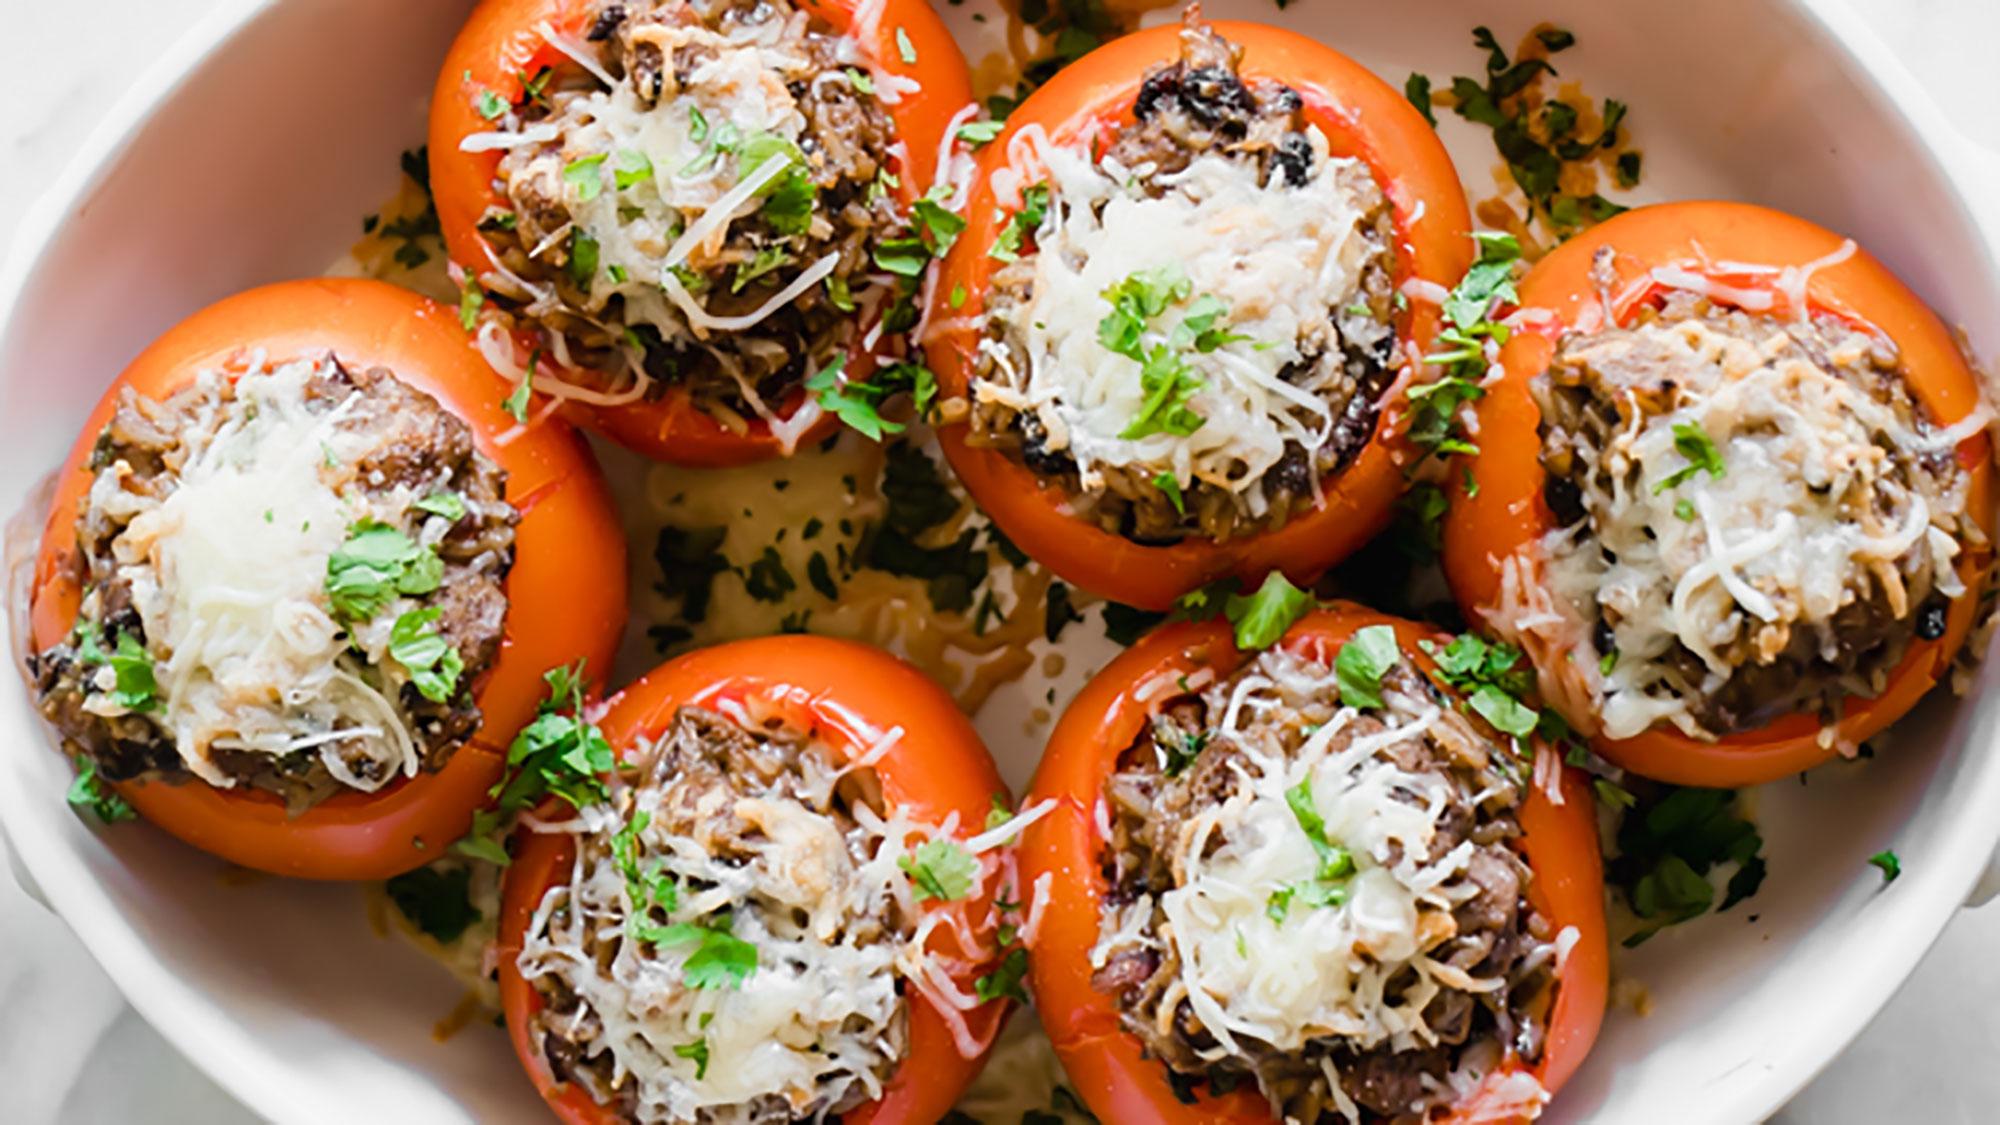 black_beans_and_rice_stuffed_tomatoes_2000x1125.jpg